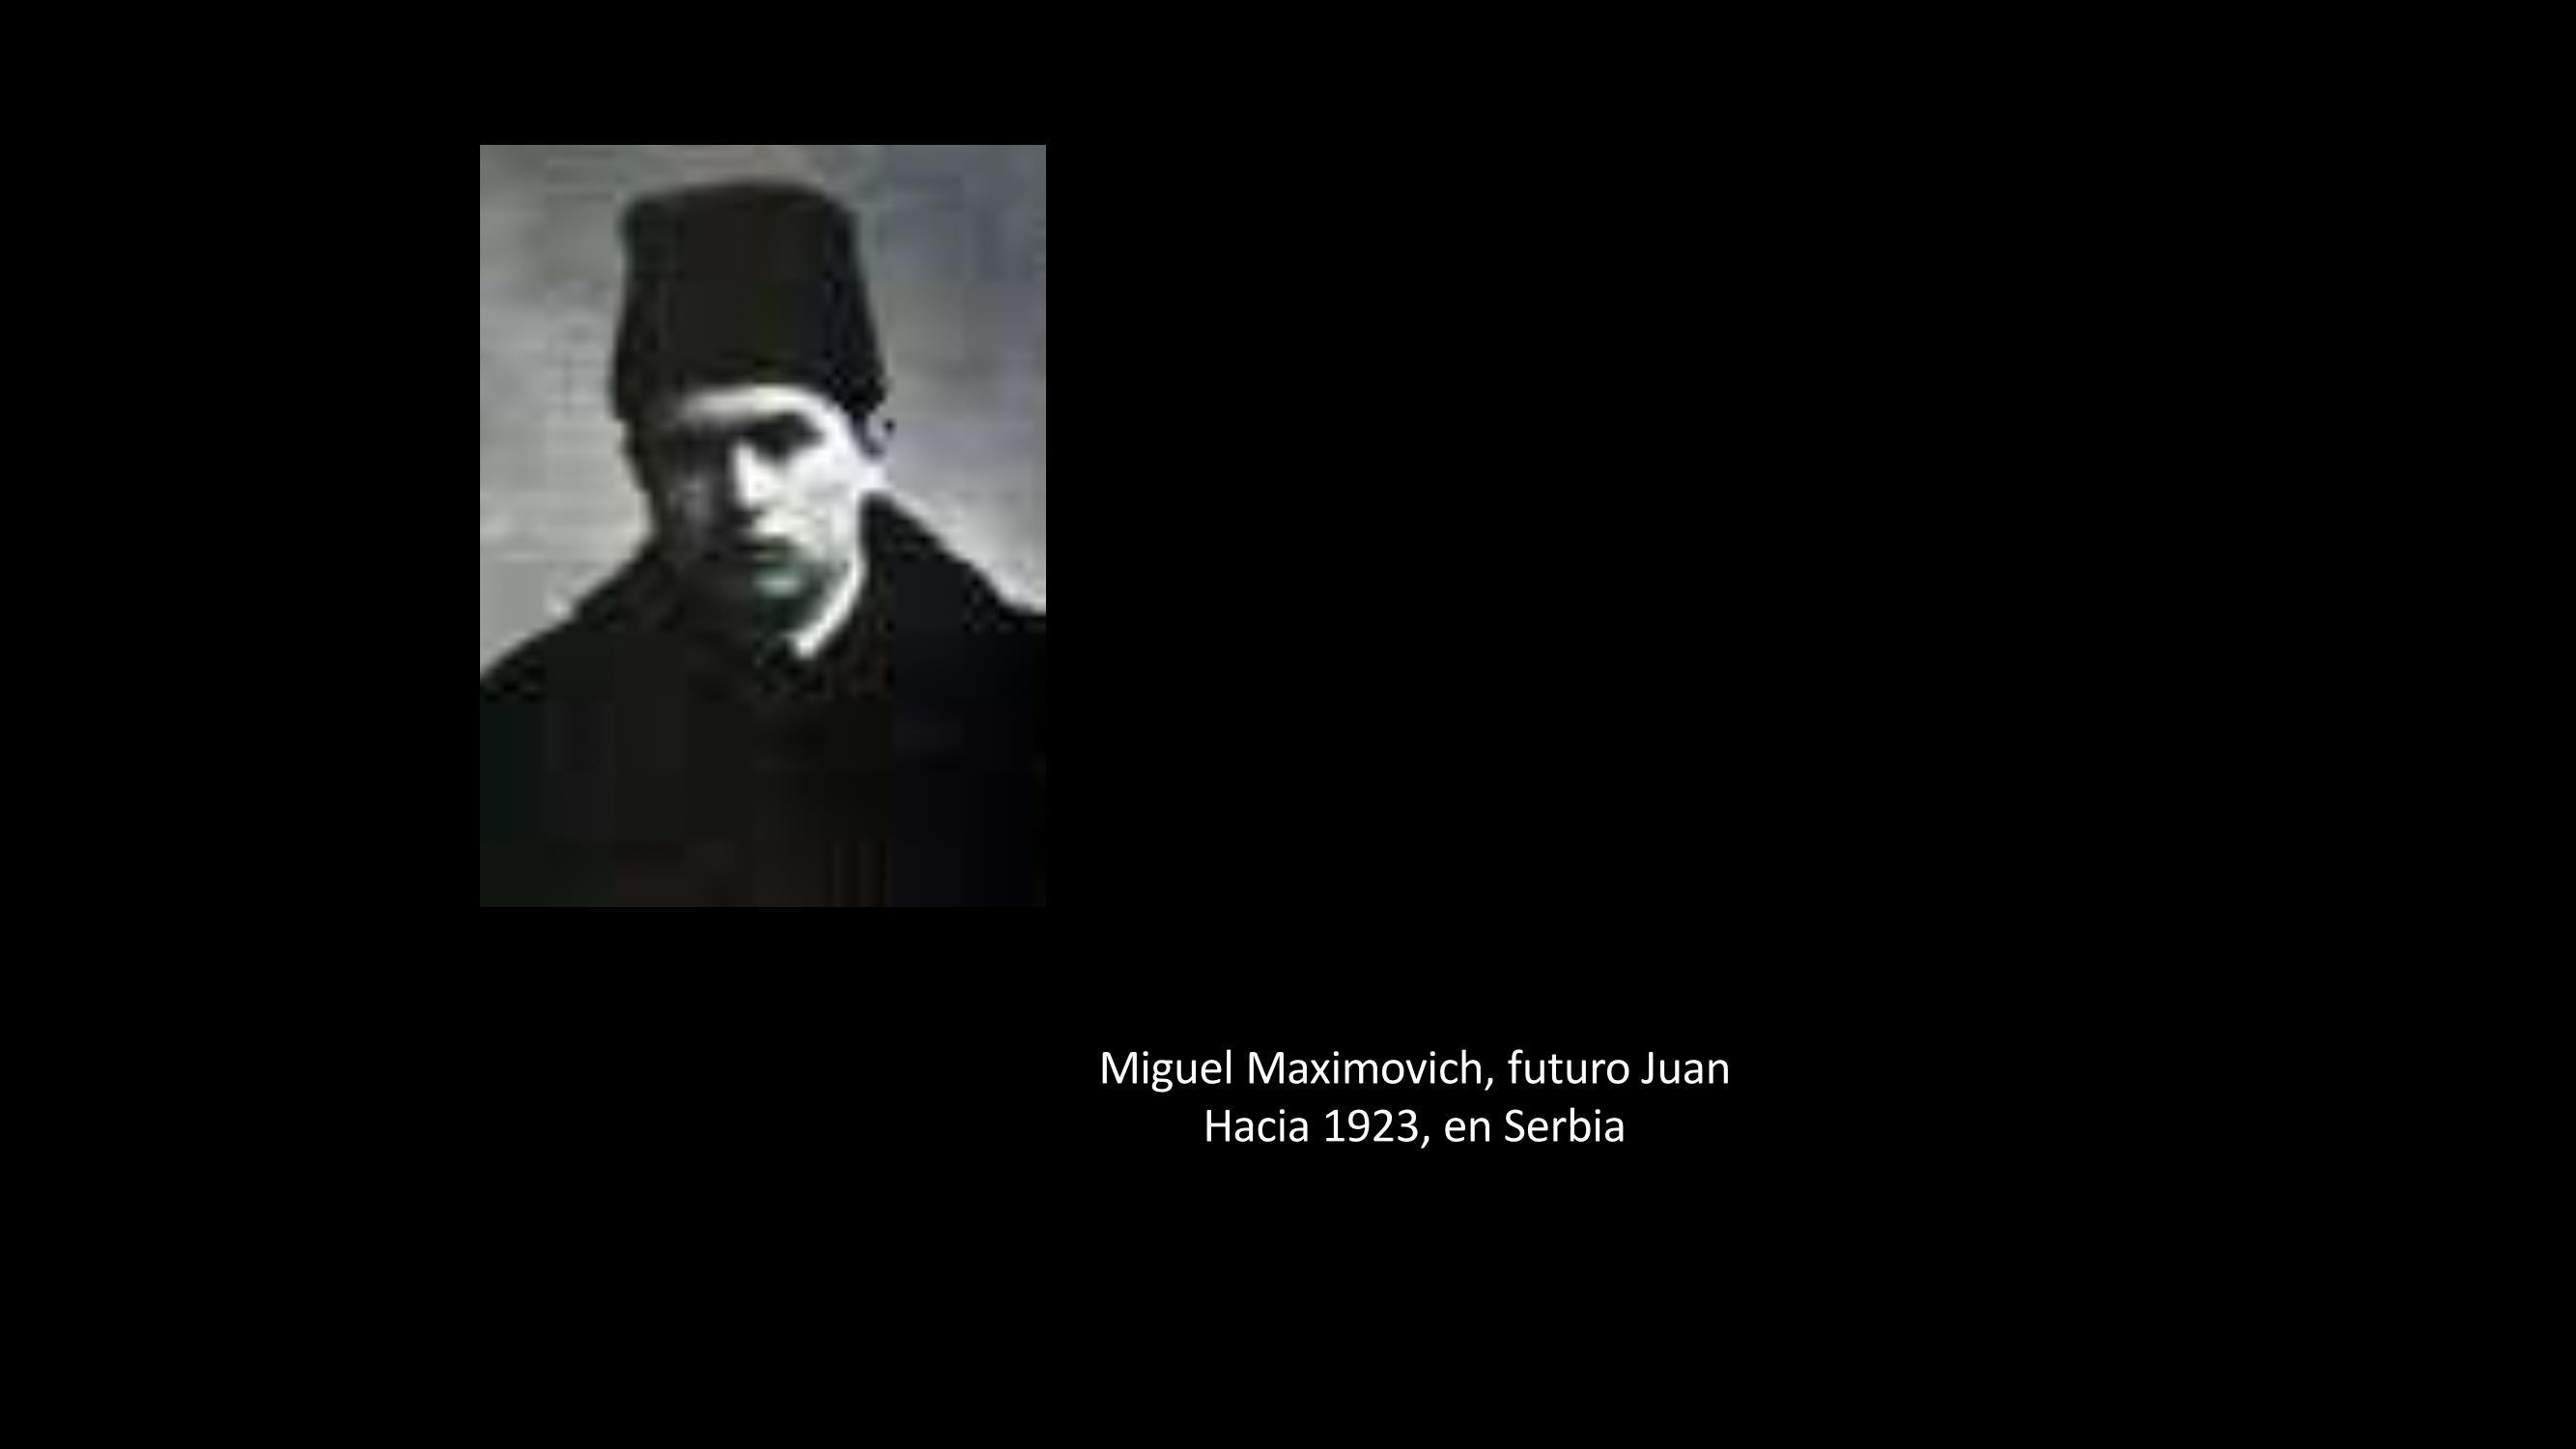 [32] Miguel Maximovich, futuro San Juan de Shangai, 1923